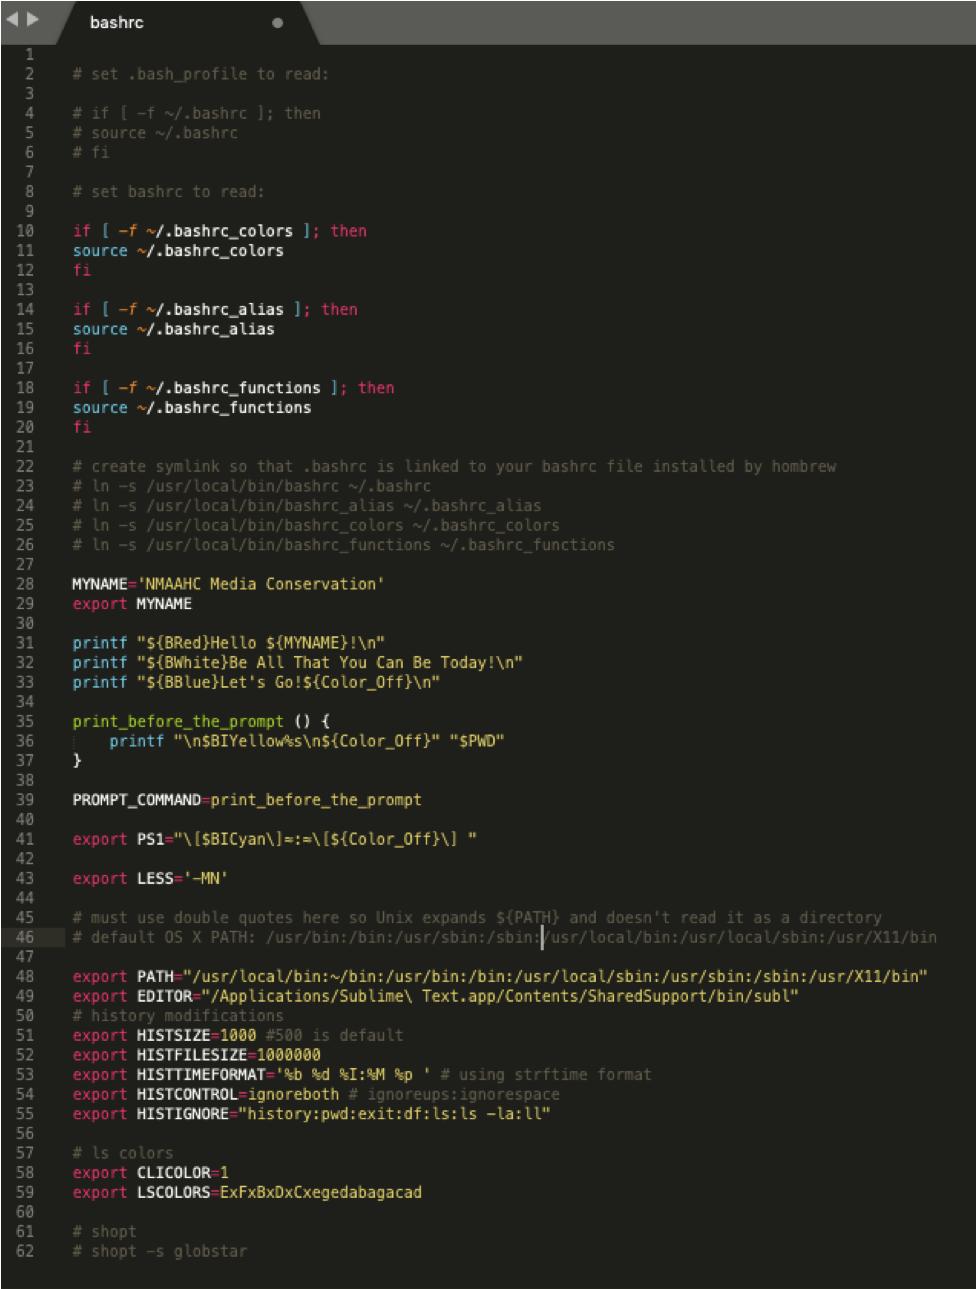 Screen capture of a basic bash computer programming file